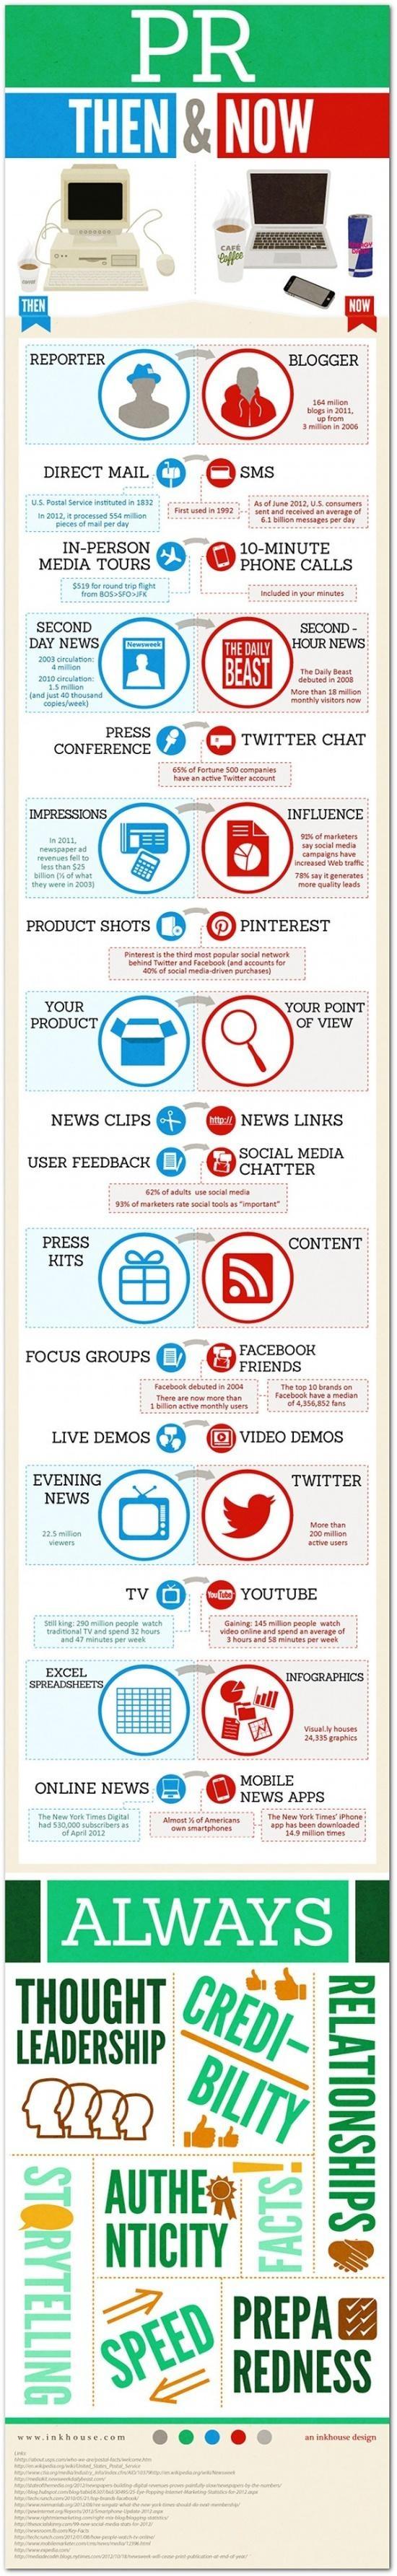 Public Relations: Then  Now #PR #infographic #marketing #socialmedia